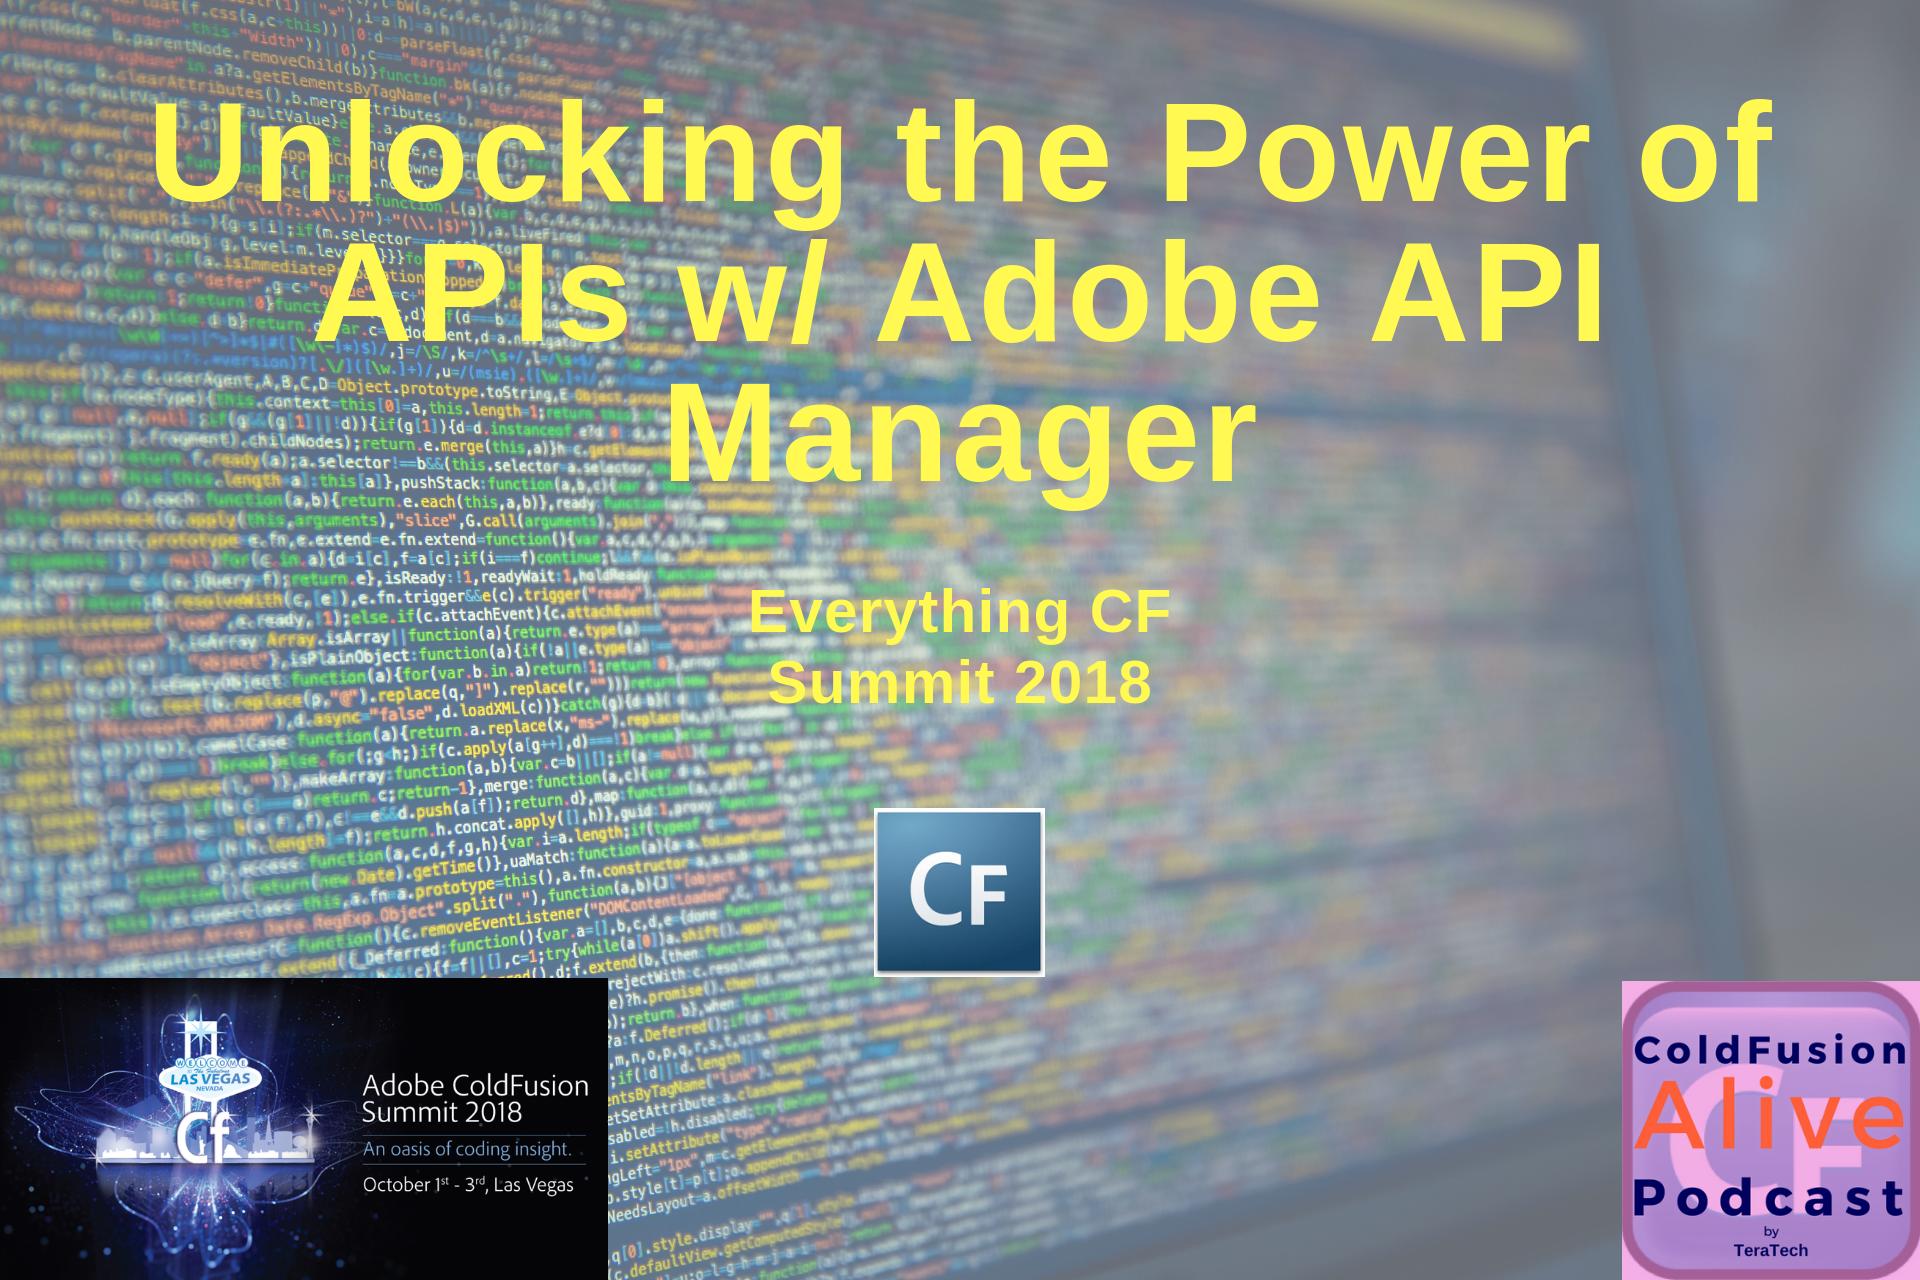 Everything CF Summit 2018: Unlocking the Power of APIs w/ Adobe API Manager